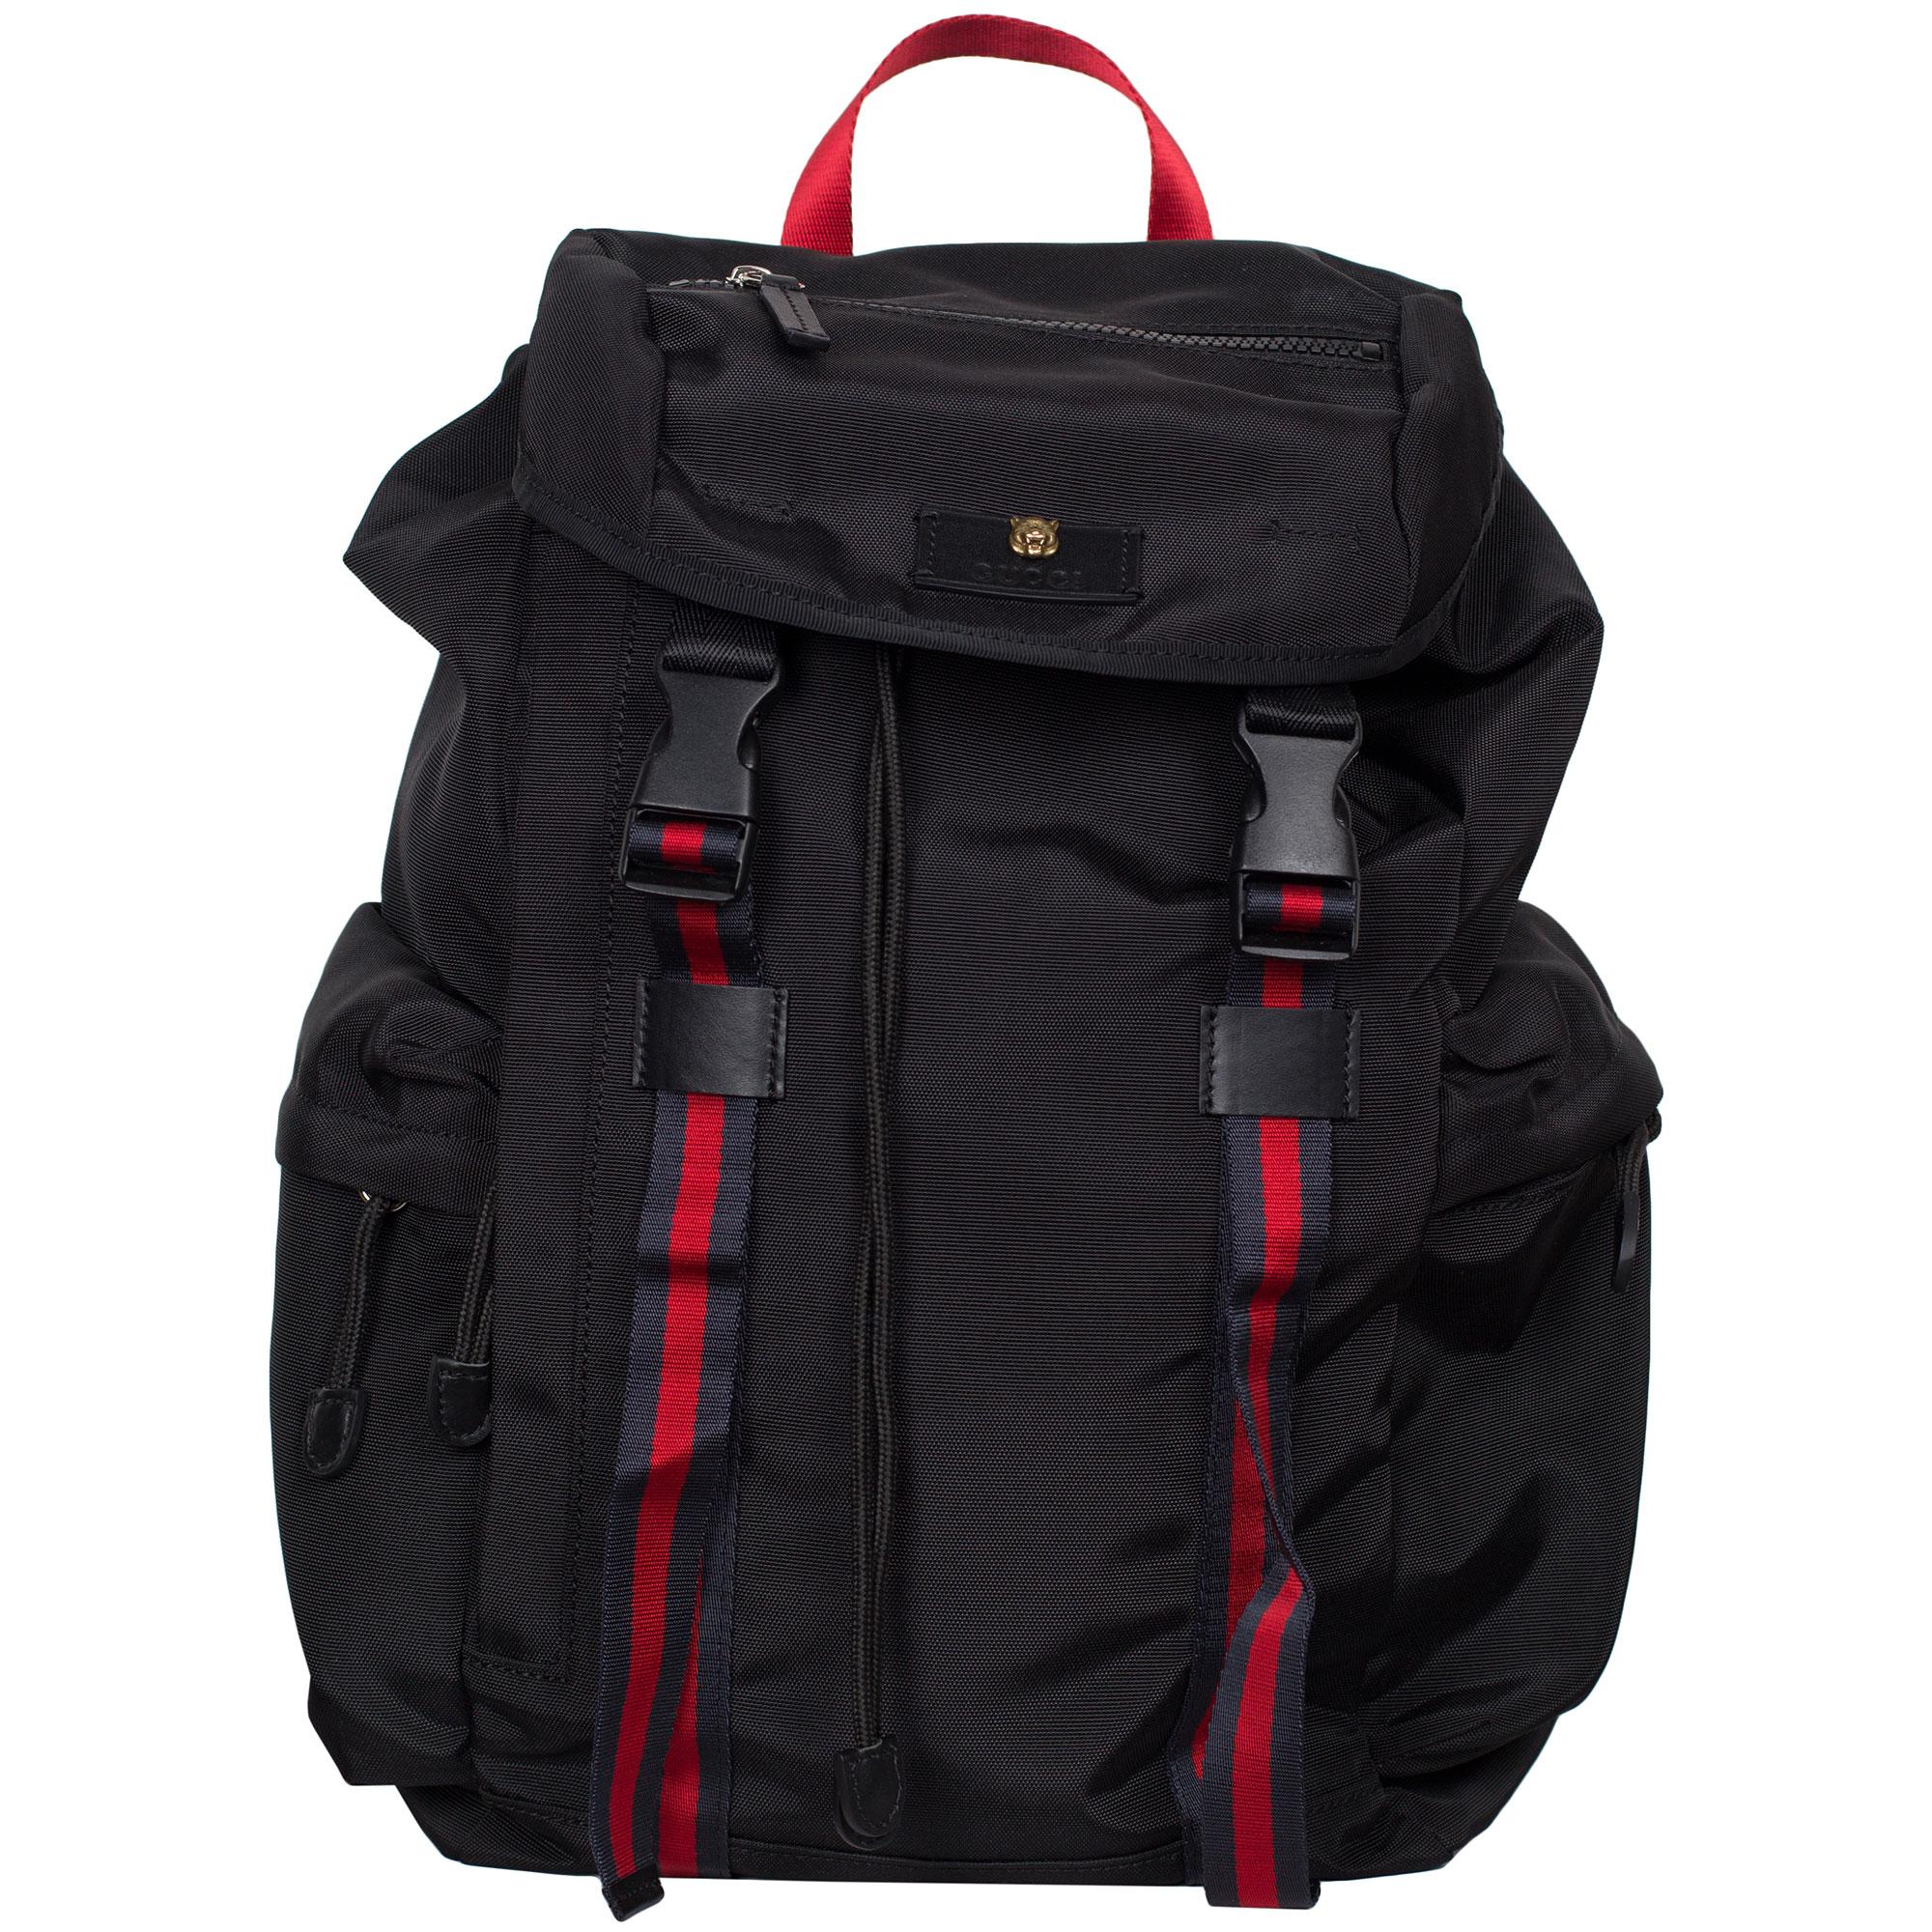 Черный рюкзак Gucci с фирменной вставкой 57b4e44d3e1dc